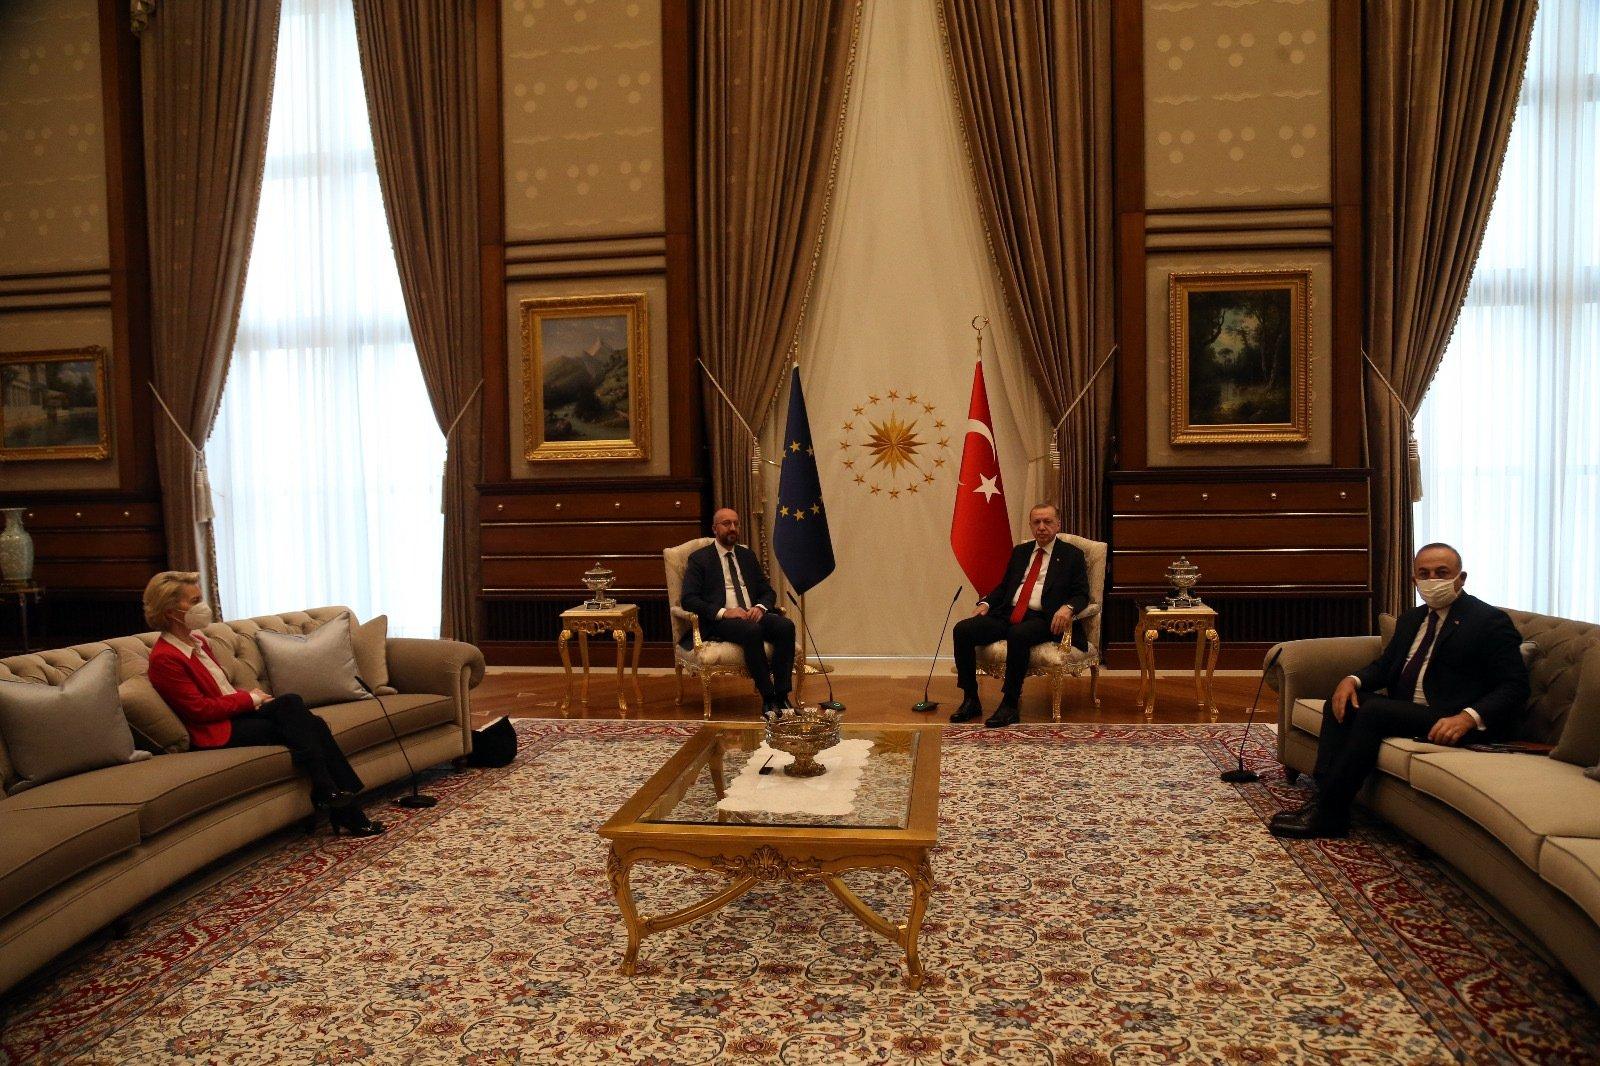 President Recep Tayyip Erdoğan receives European Council President Charles Michel and European Commission President Ursula von der Leyen at the Presidential Complex in Ankara, Turkey, April 6, 2021. (Courtesy of the EU Delegation to Turkey)